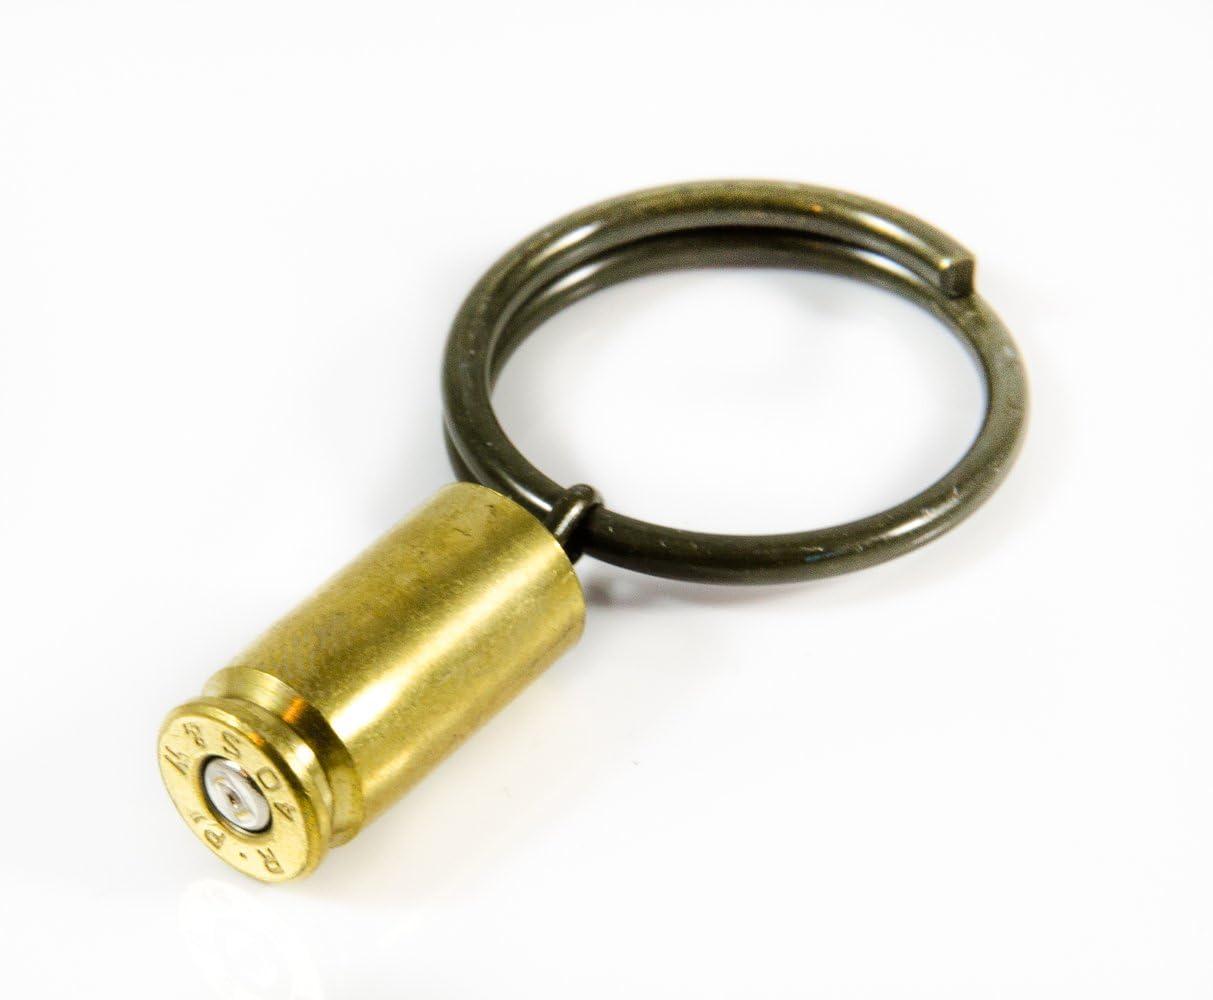 Genuine 9mm Caliber Bullet Key Ring